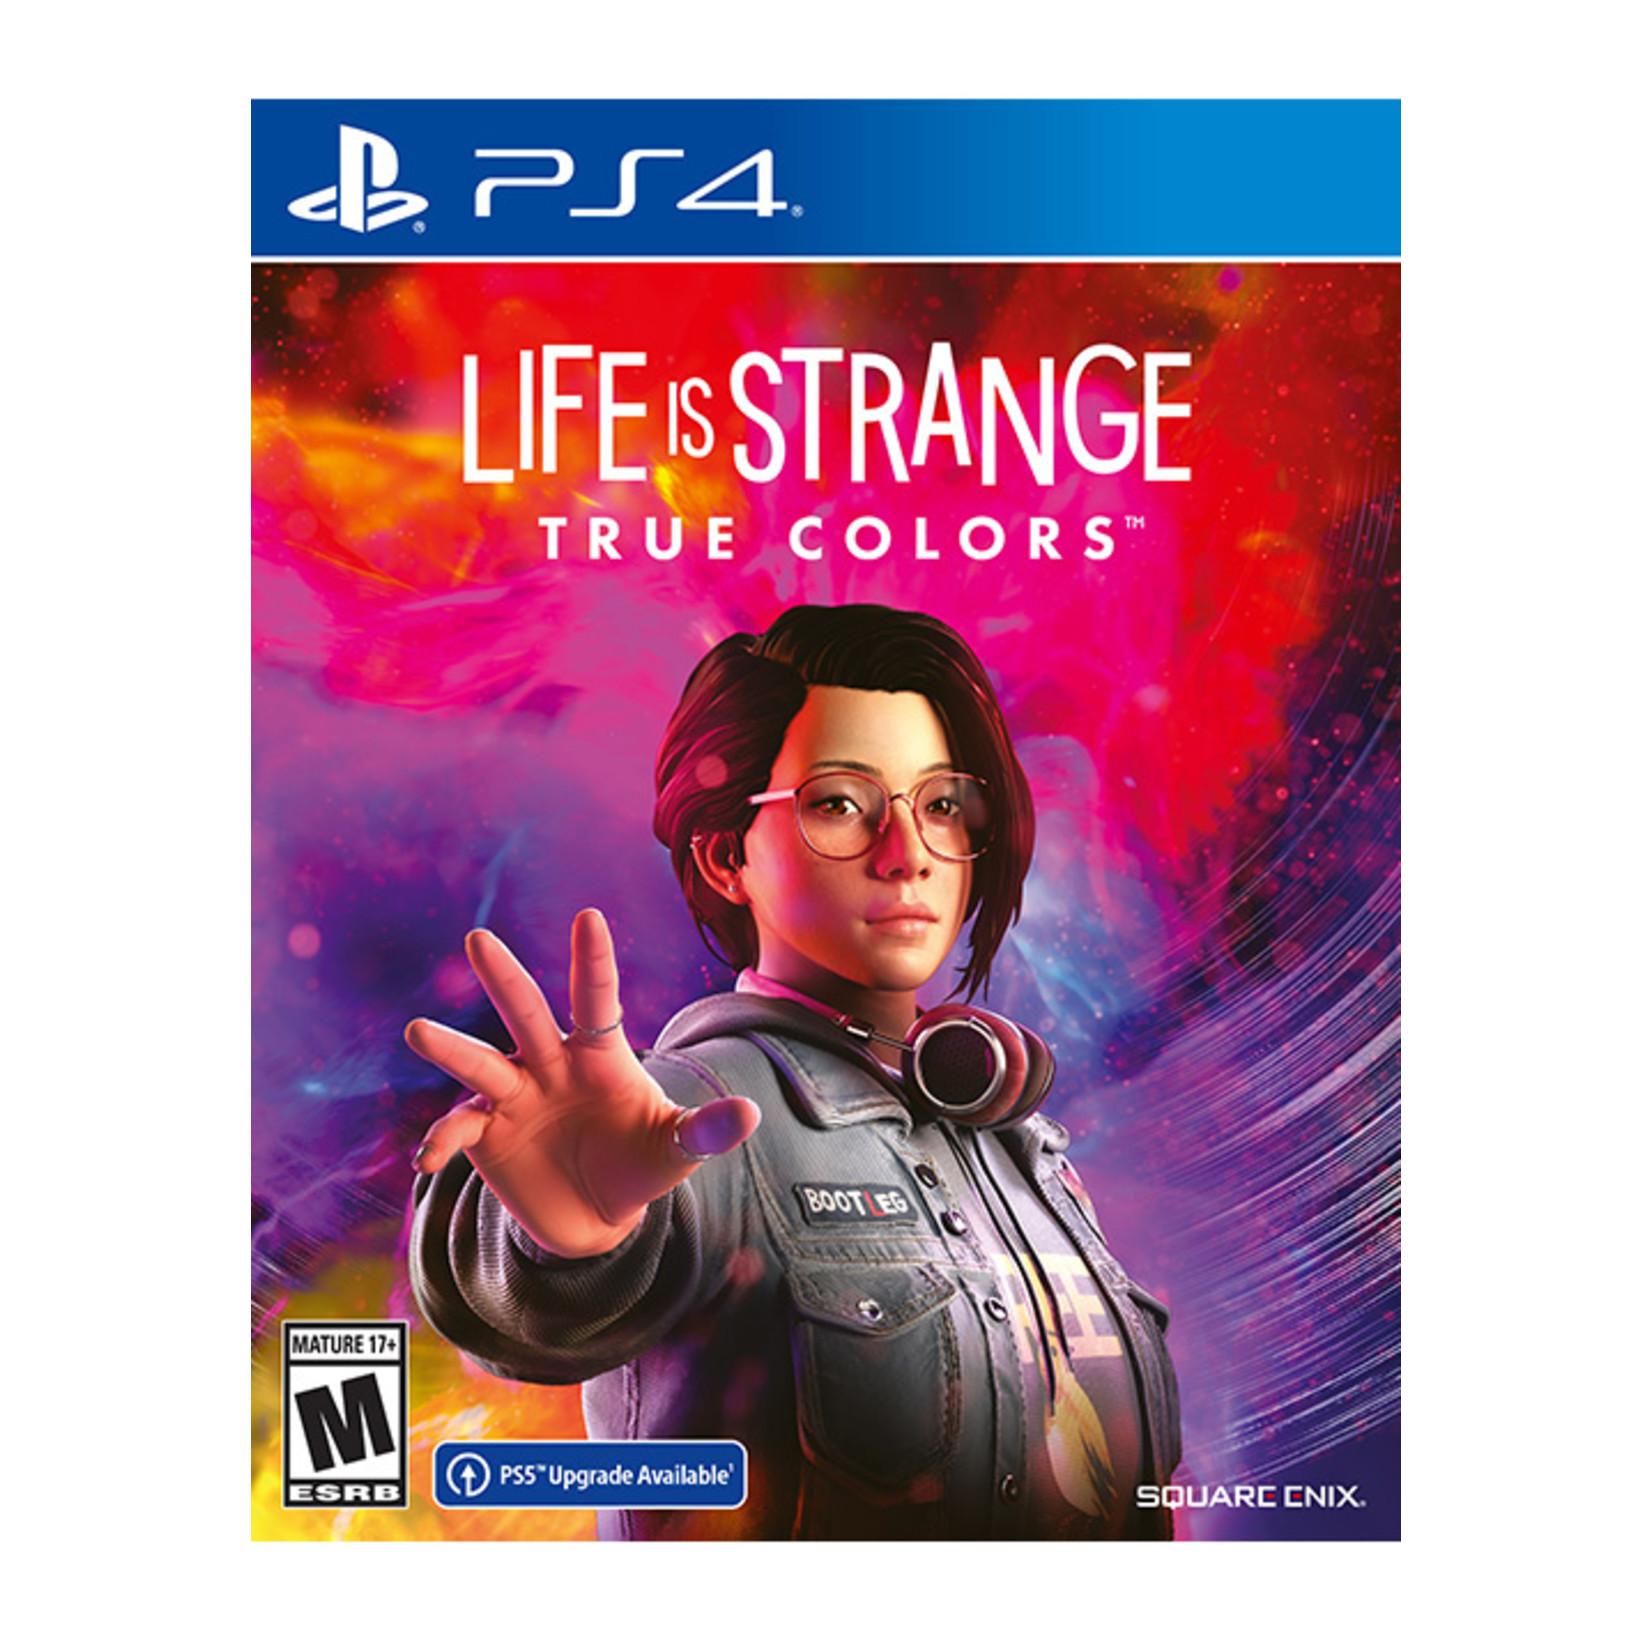 PS4-Life is Strange: True Colors